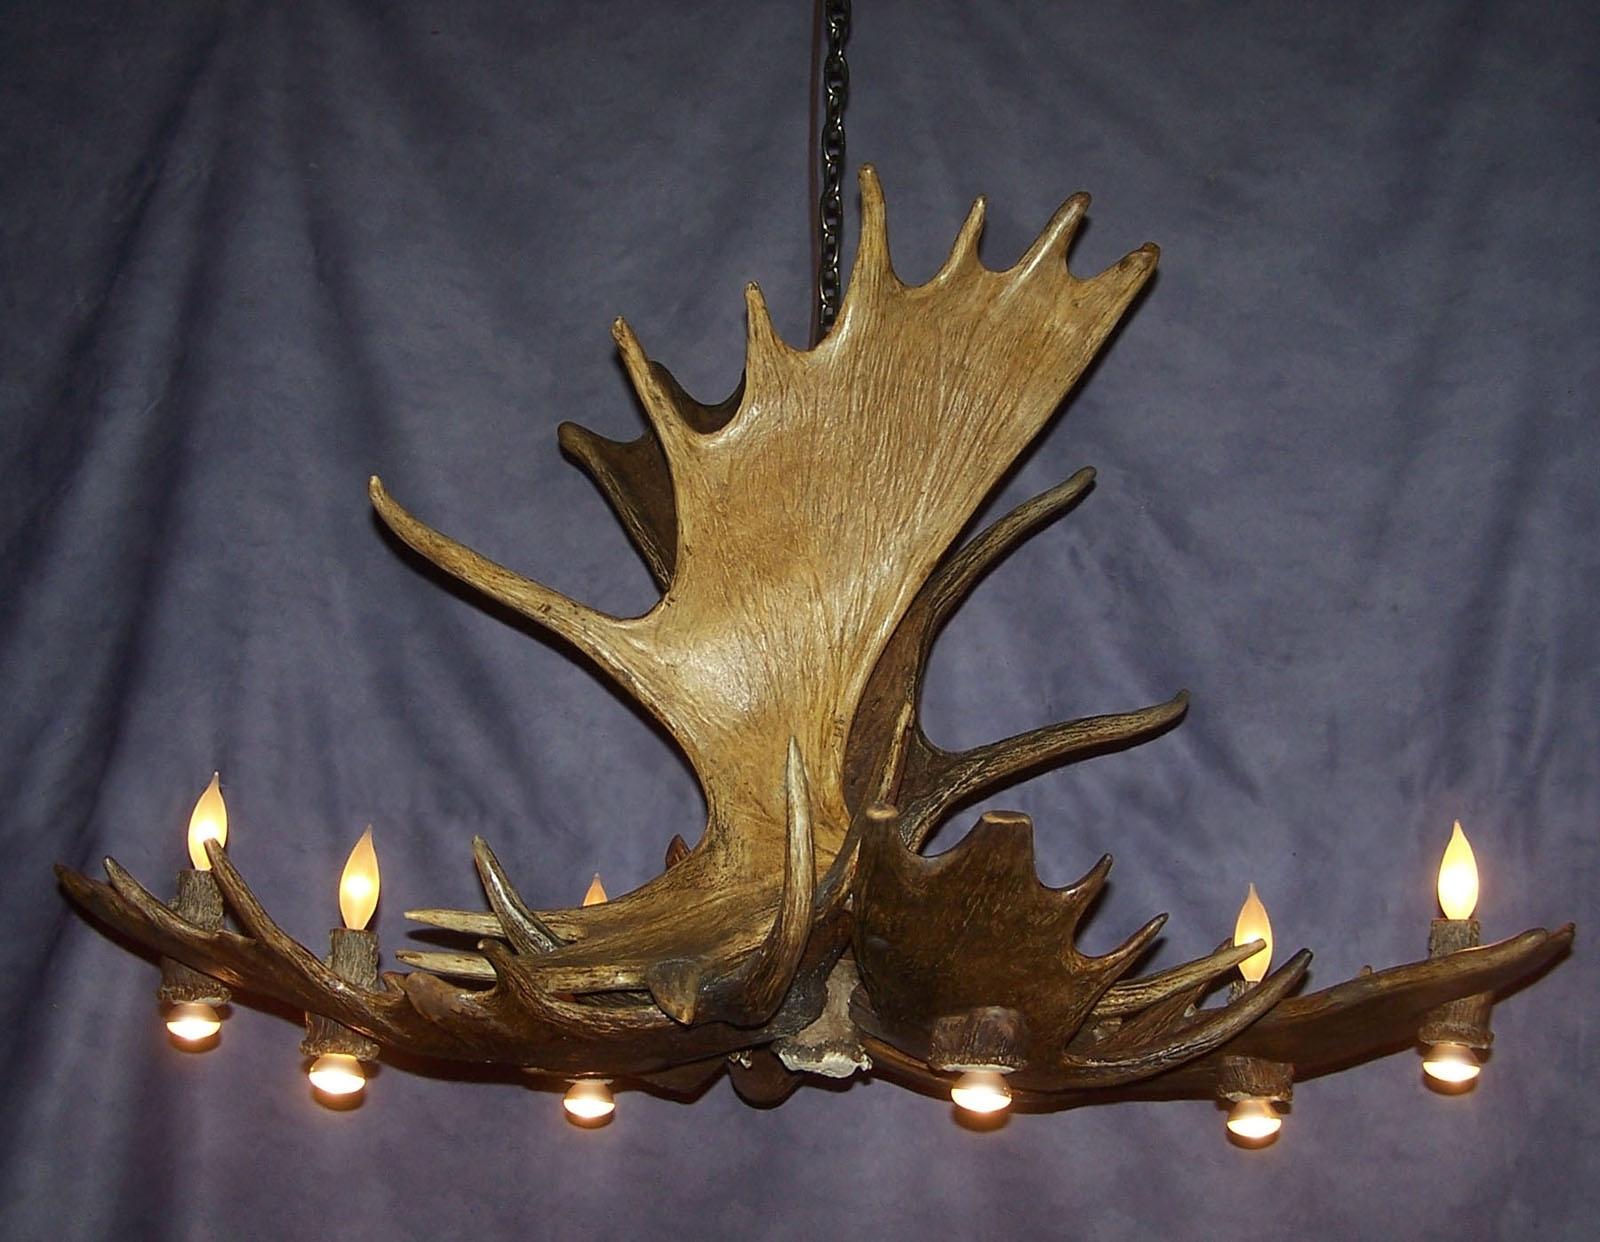 Most Recent Moose Pool Table Antler Chandelier, Rustic Deer Lodge Light, Lamps Within Modern Antler Chandelier (View 16 of 20)